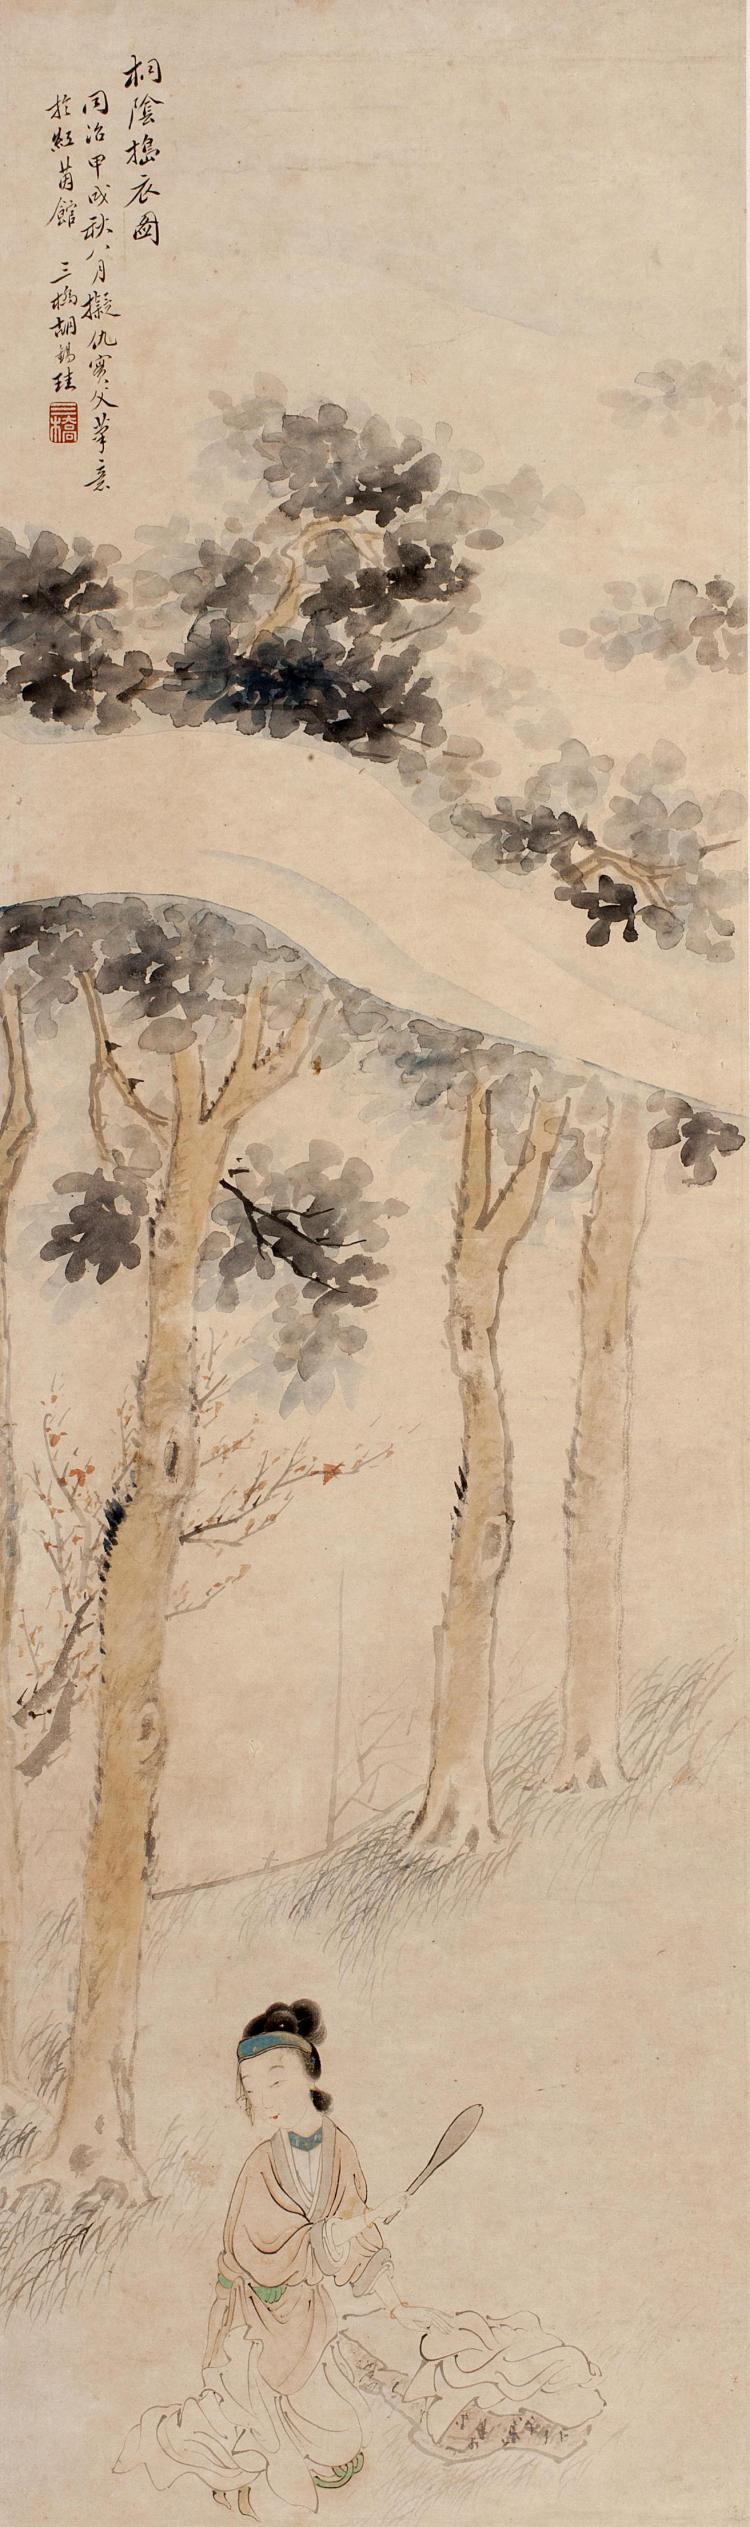 Hu Xigui (1839-1883)